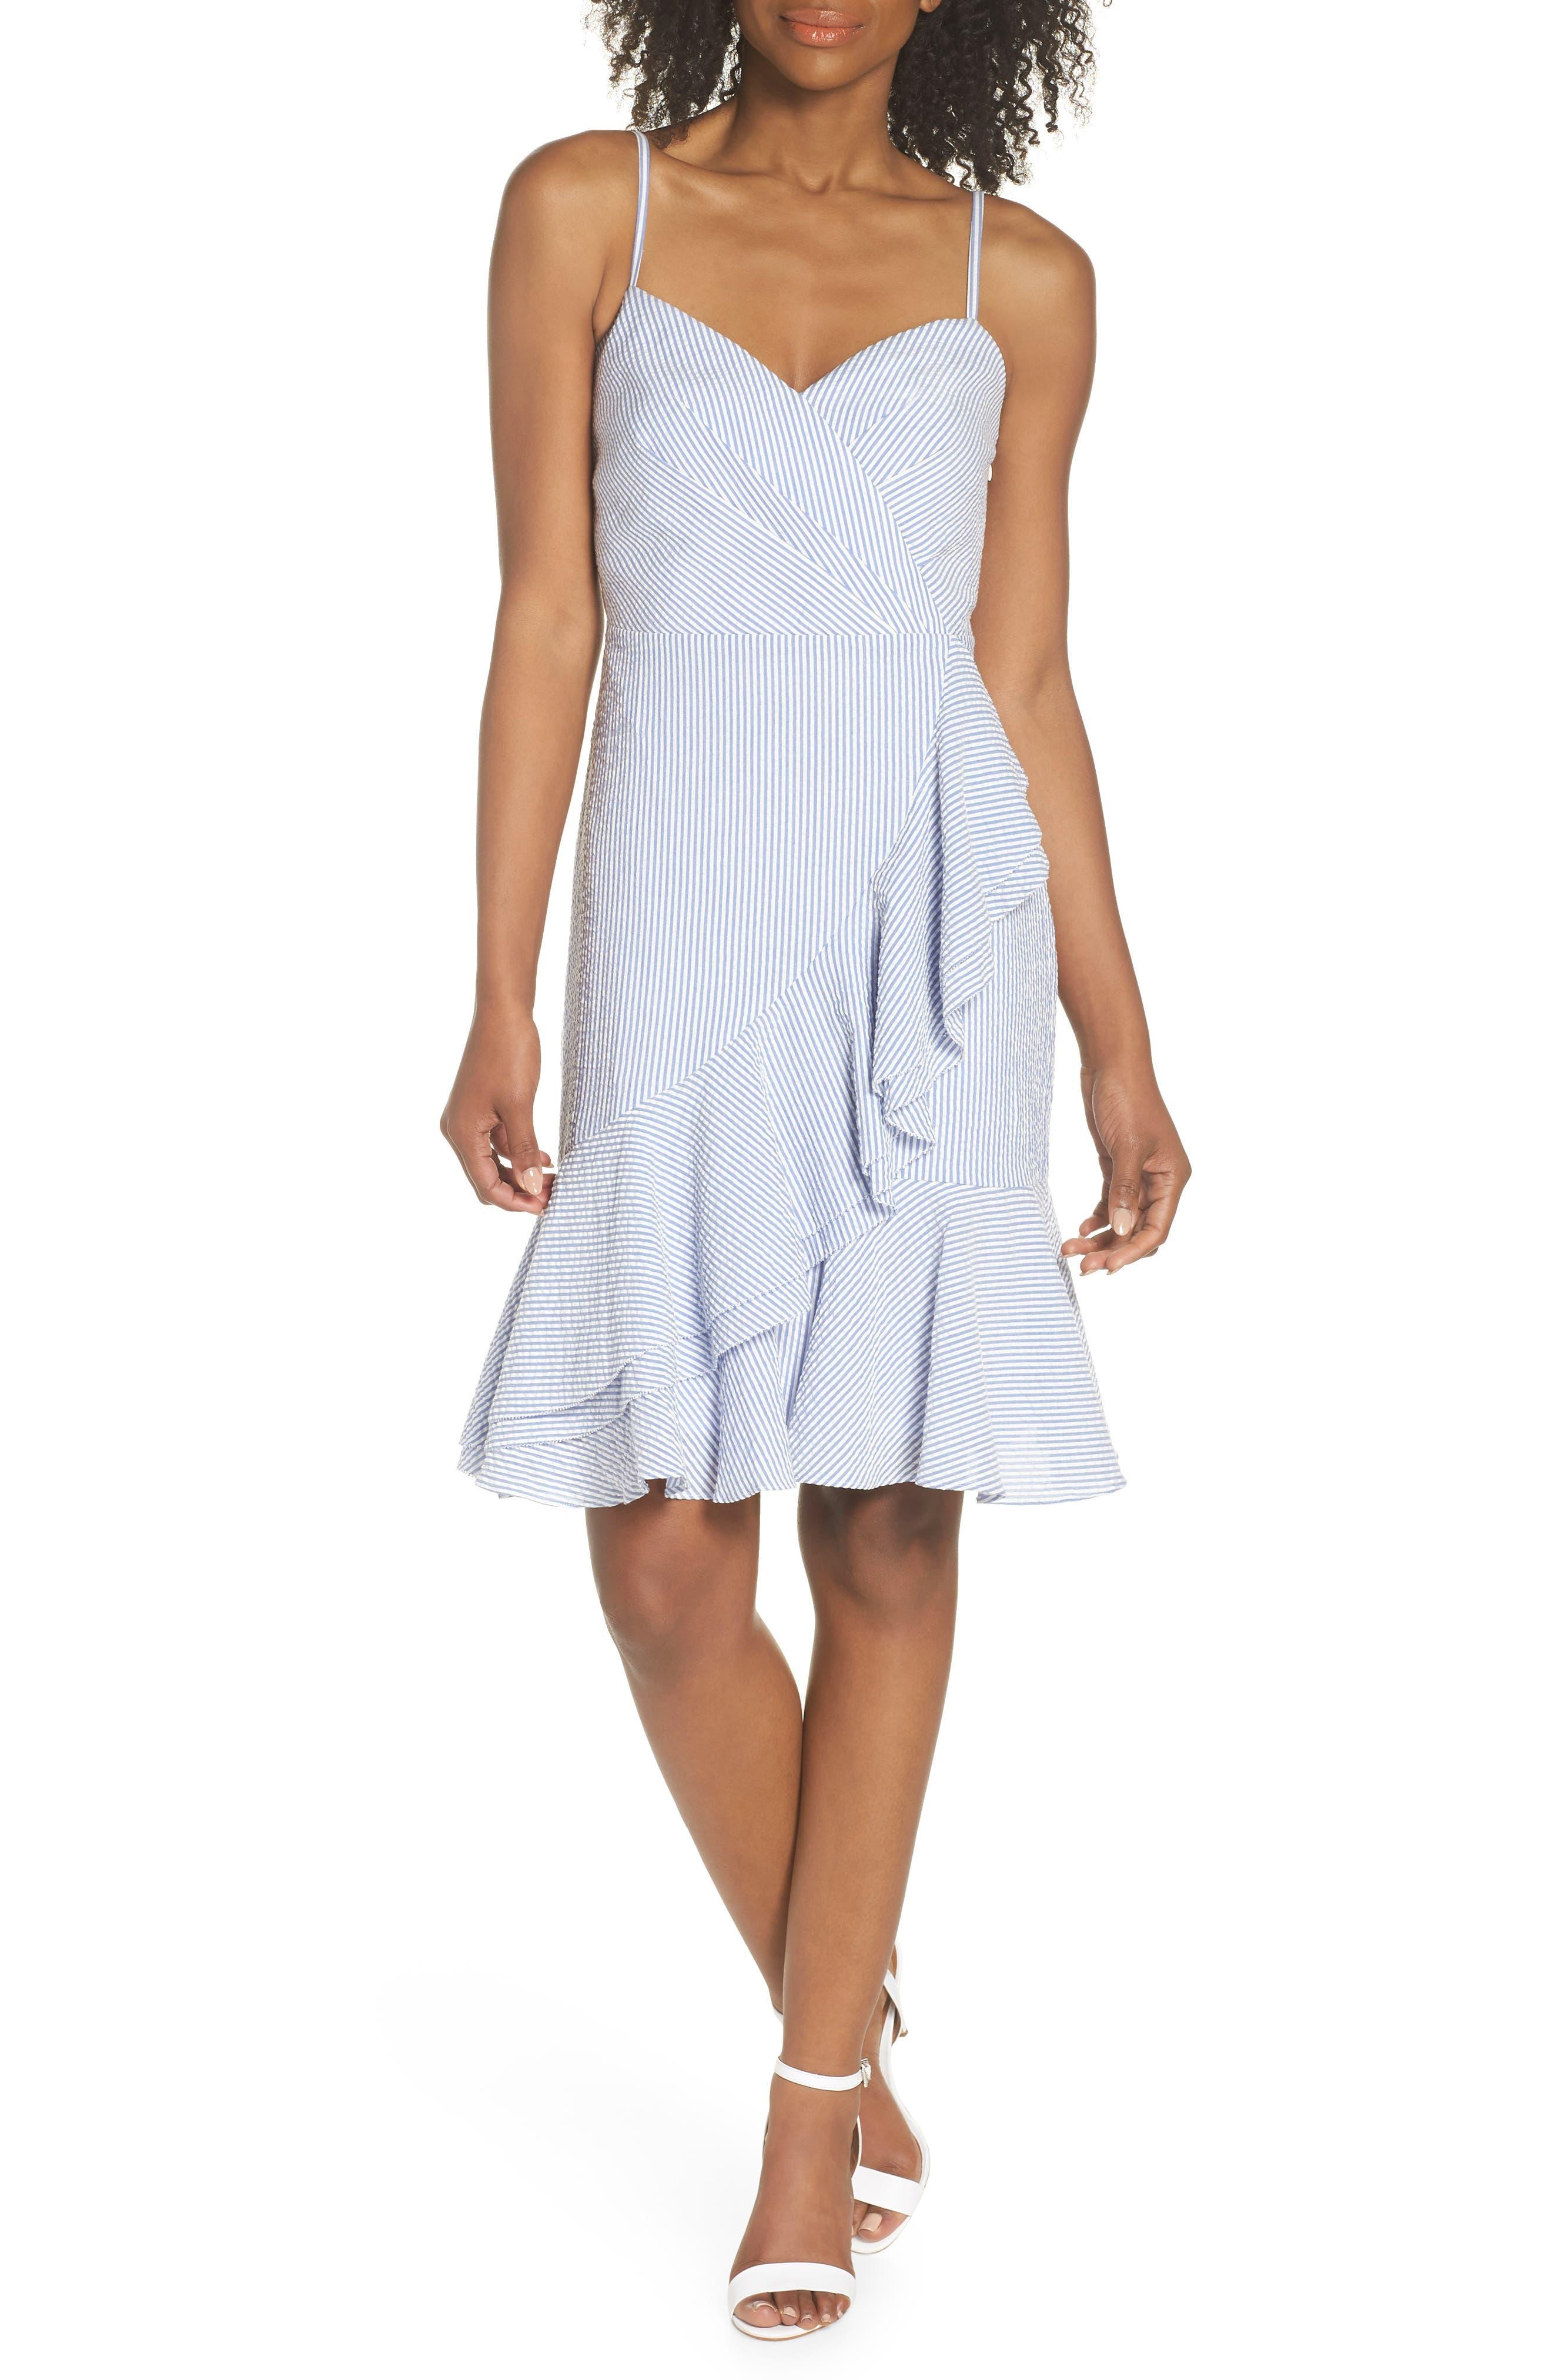 J.Crew Spaghetti Strap Ruffle Dress,                         Main,                         color, Blue White